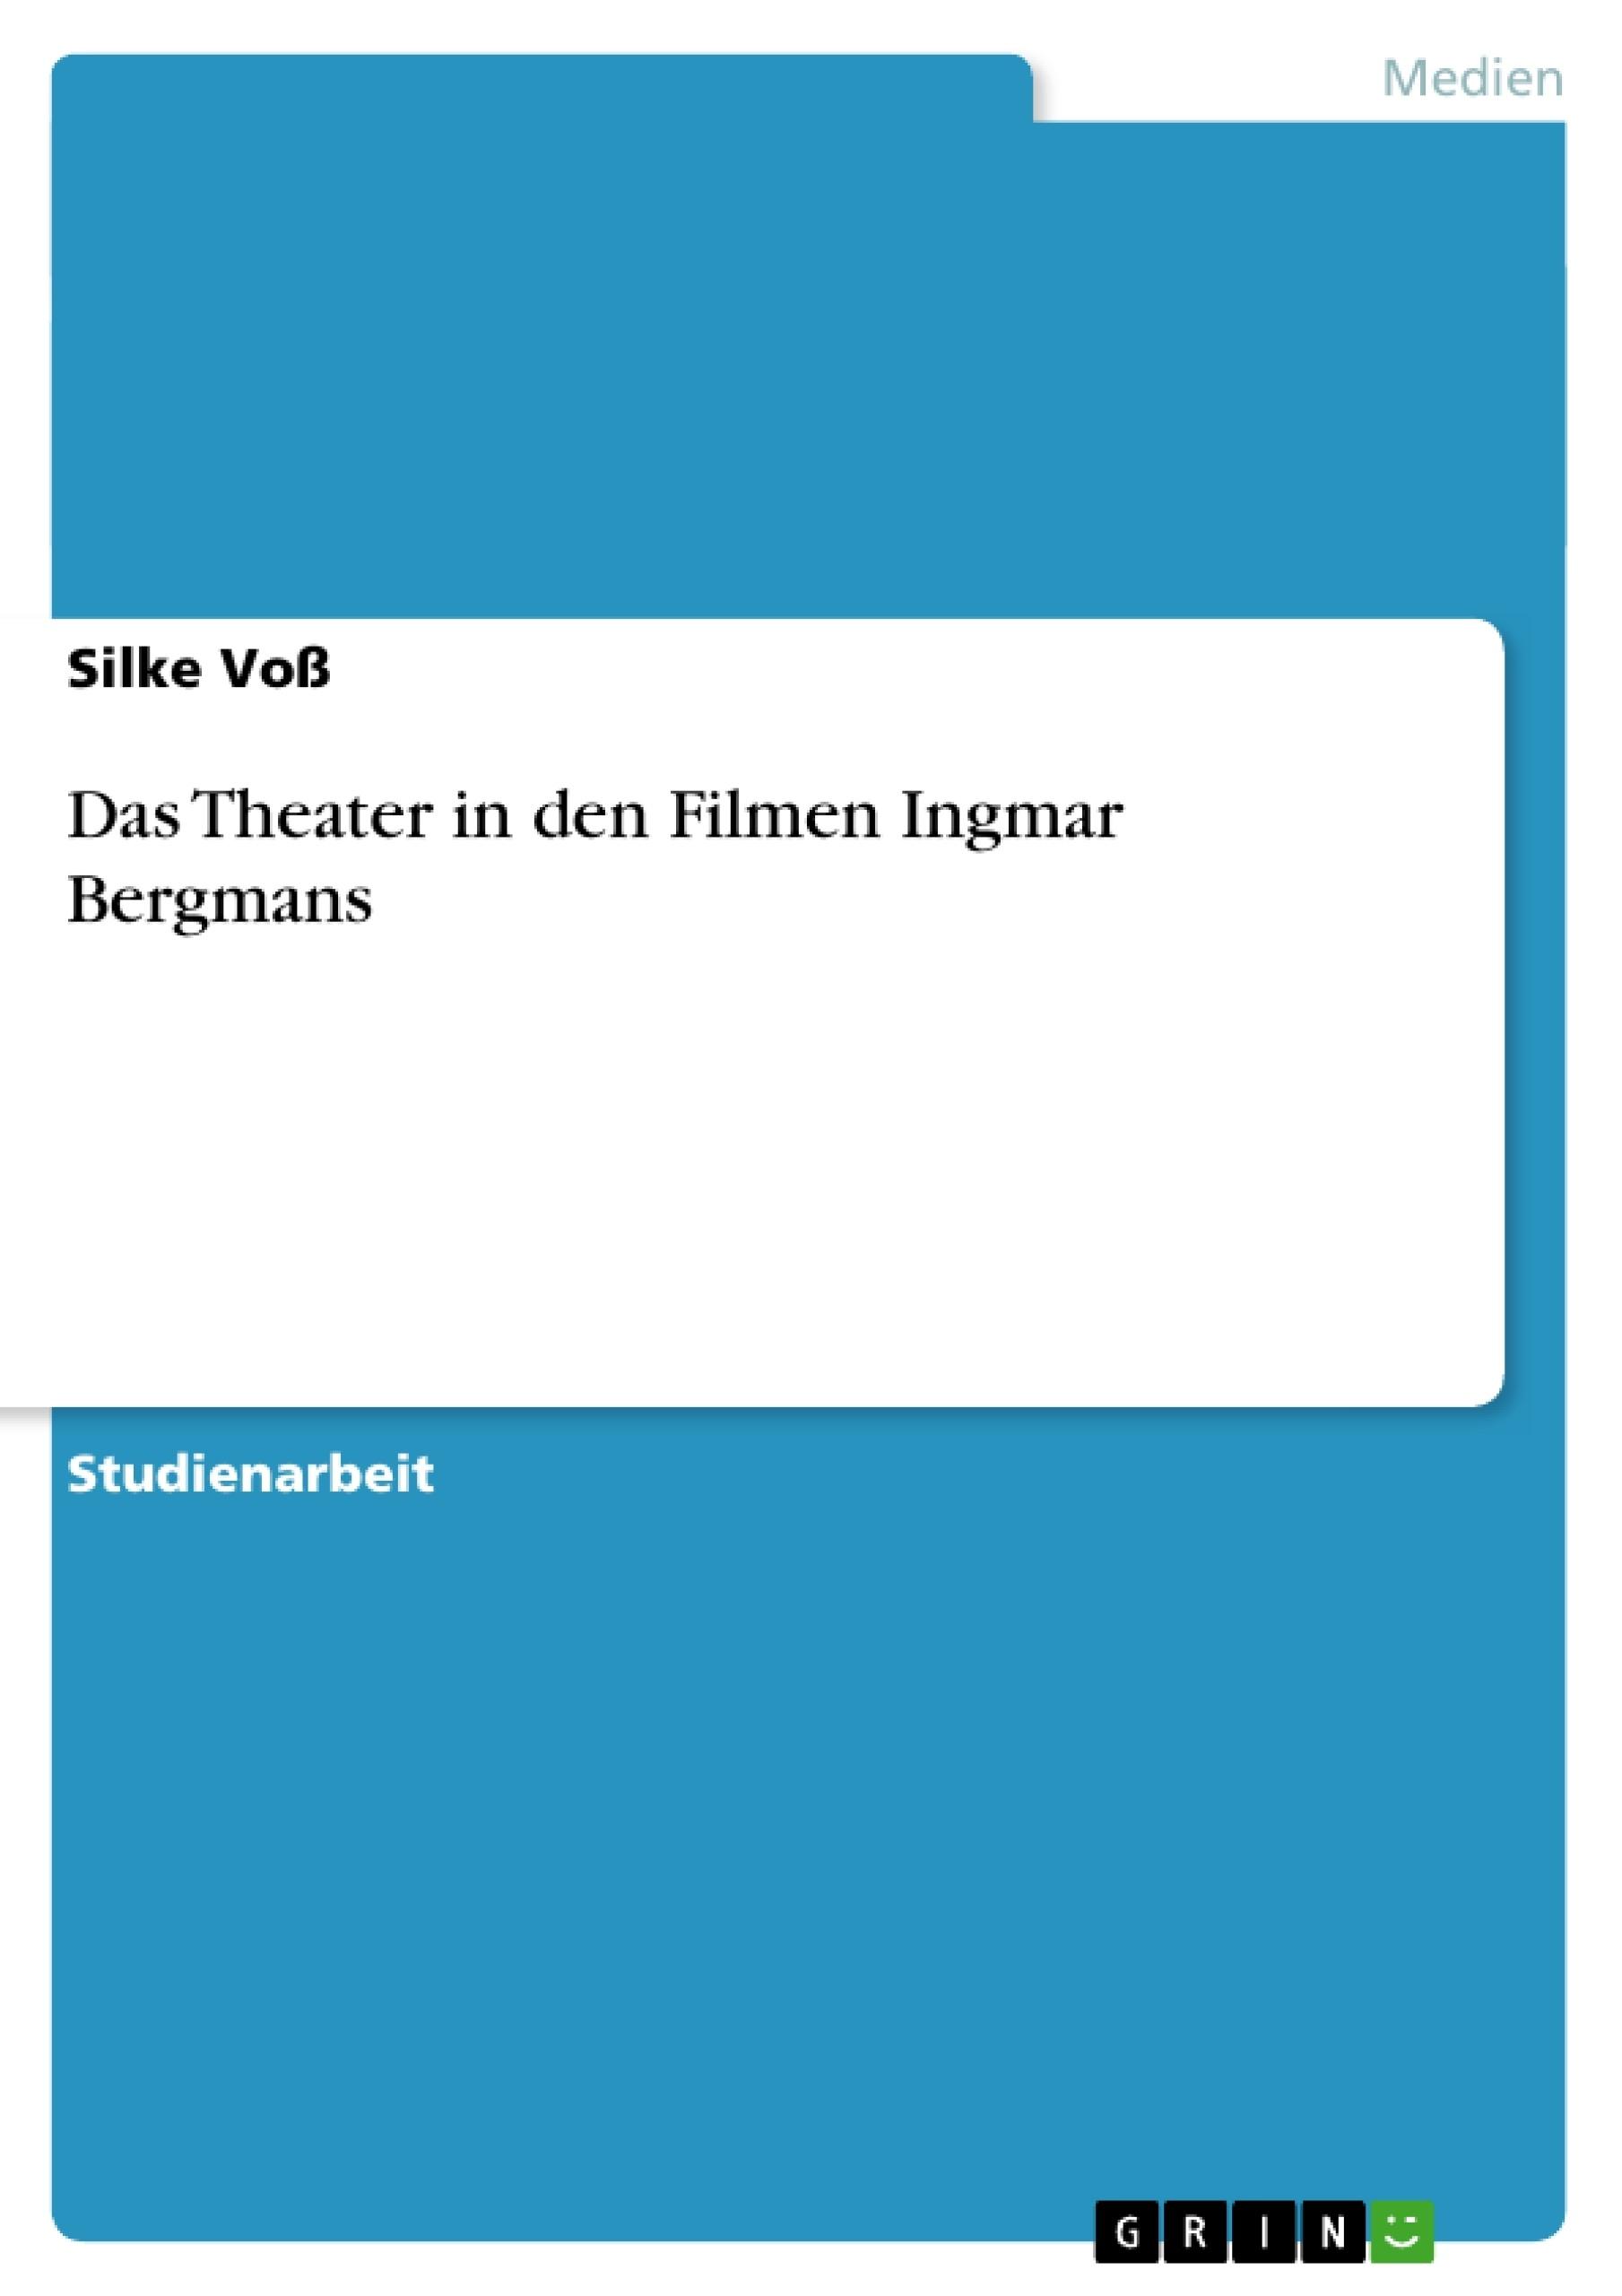 Titel: Das Theater in den Filmen Ingmar Bergmans